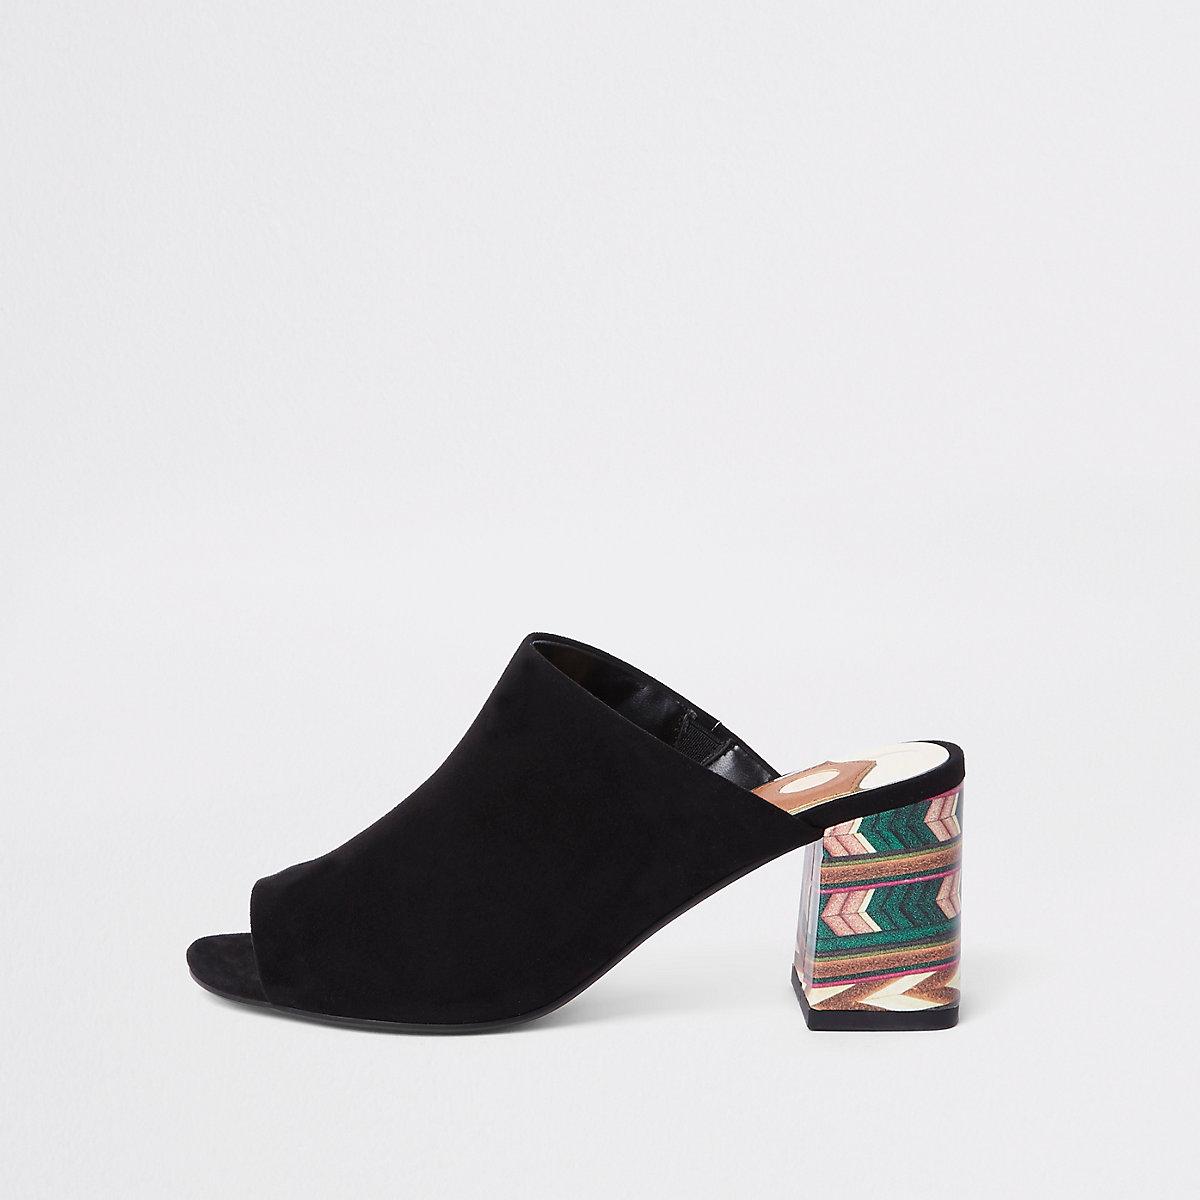 Black block print heel mules